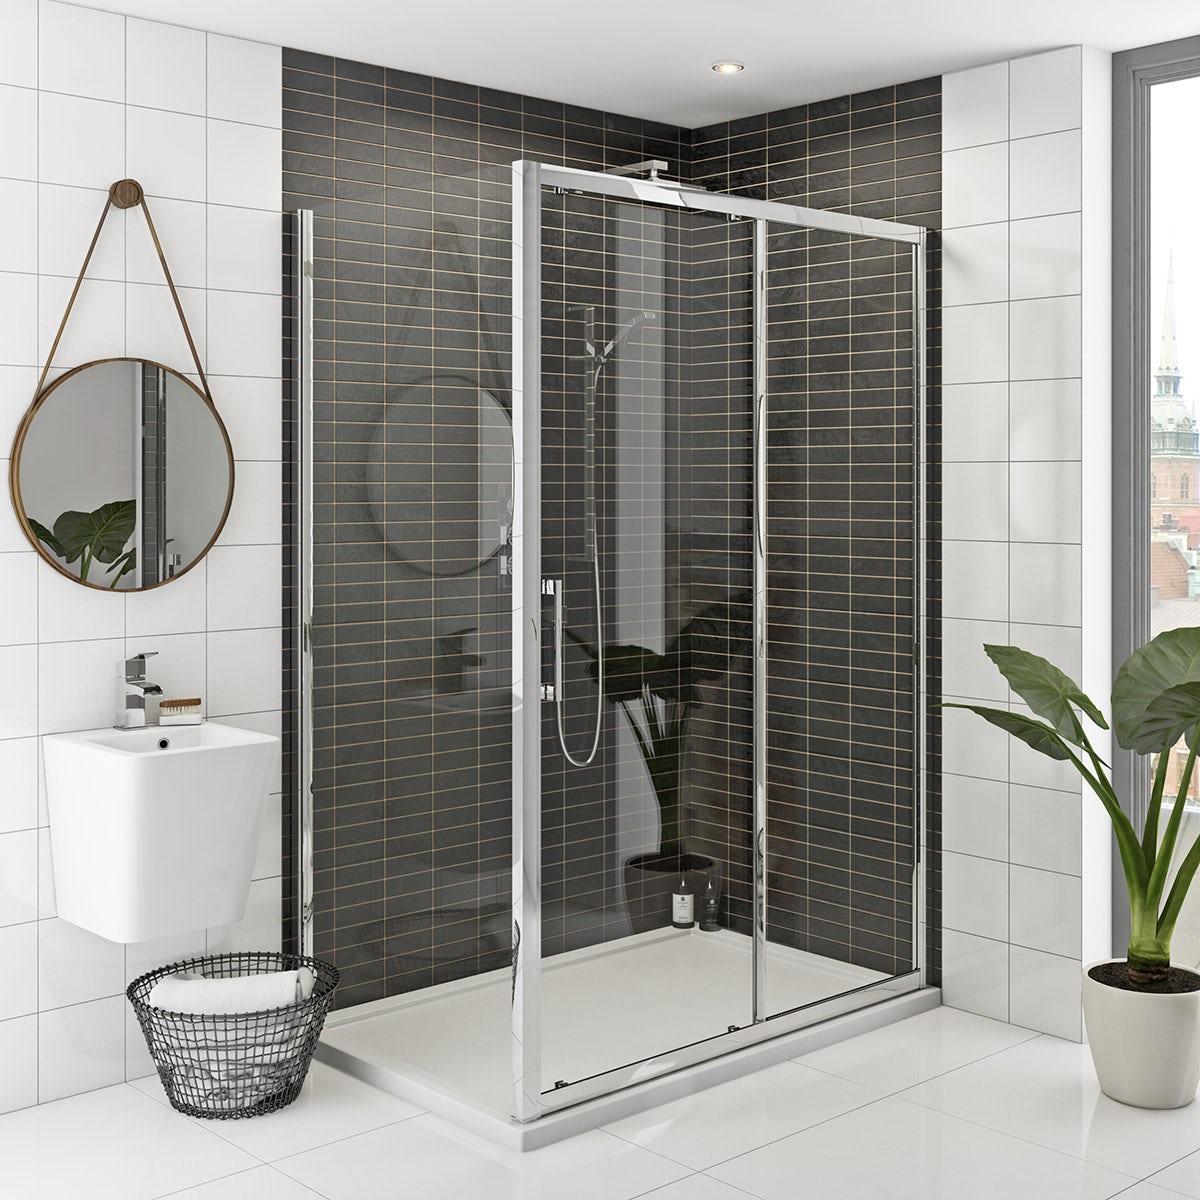 Hardy 8mm easy clean sliding shower enclosure